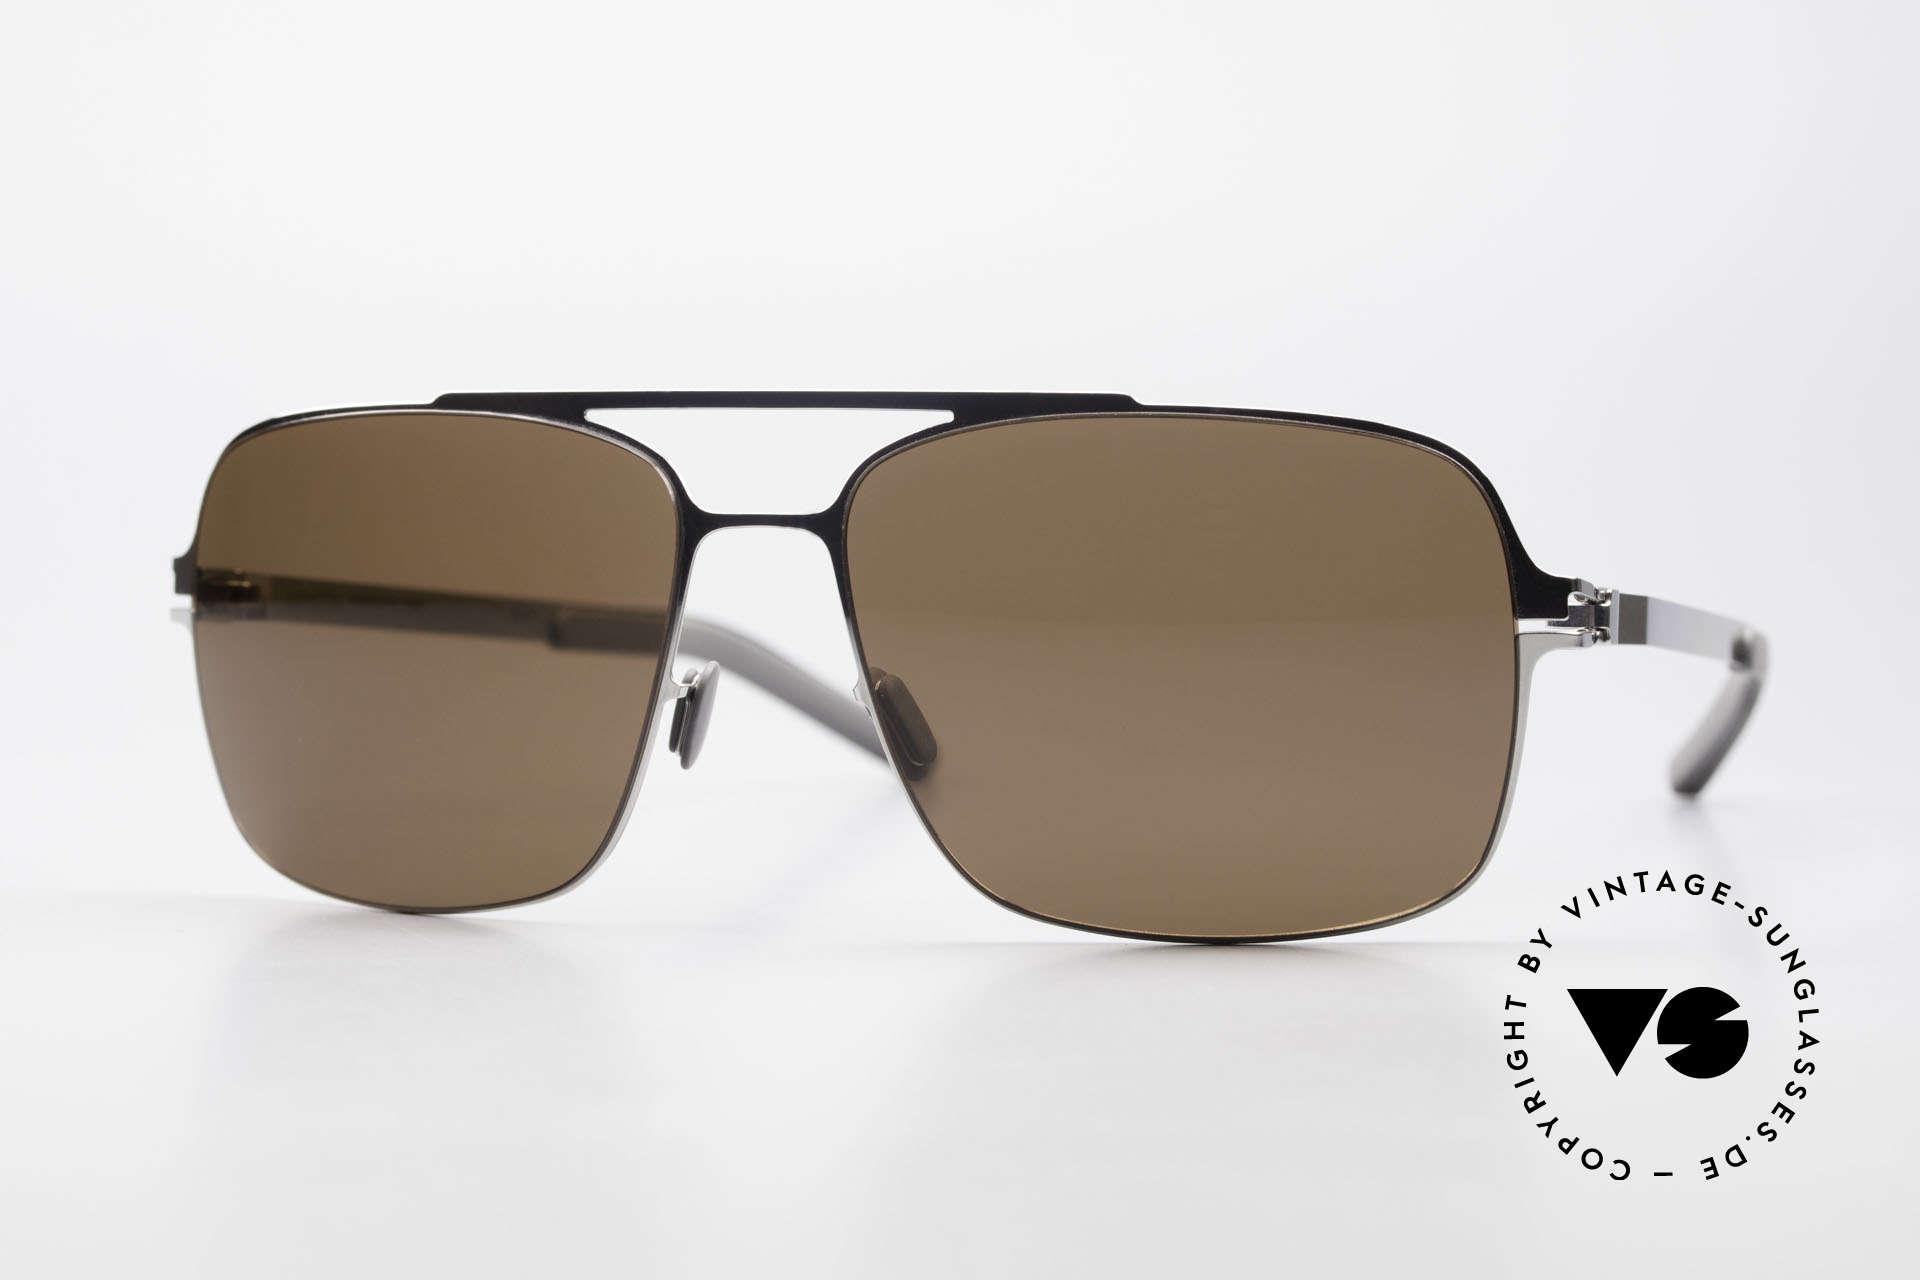 Mykita Troy Collection No 1 Mykita Shades, original VINTAGE MYKITA men's sunglasses from 2010, Made for Men